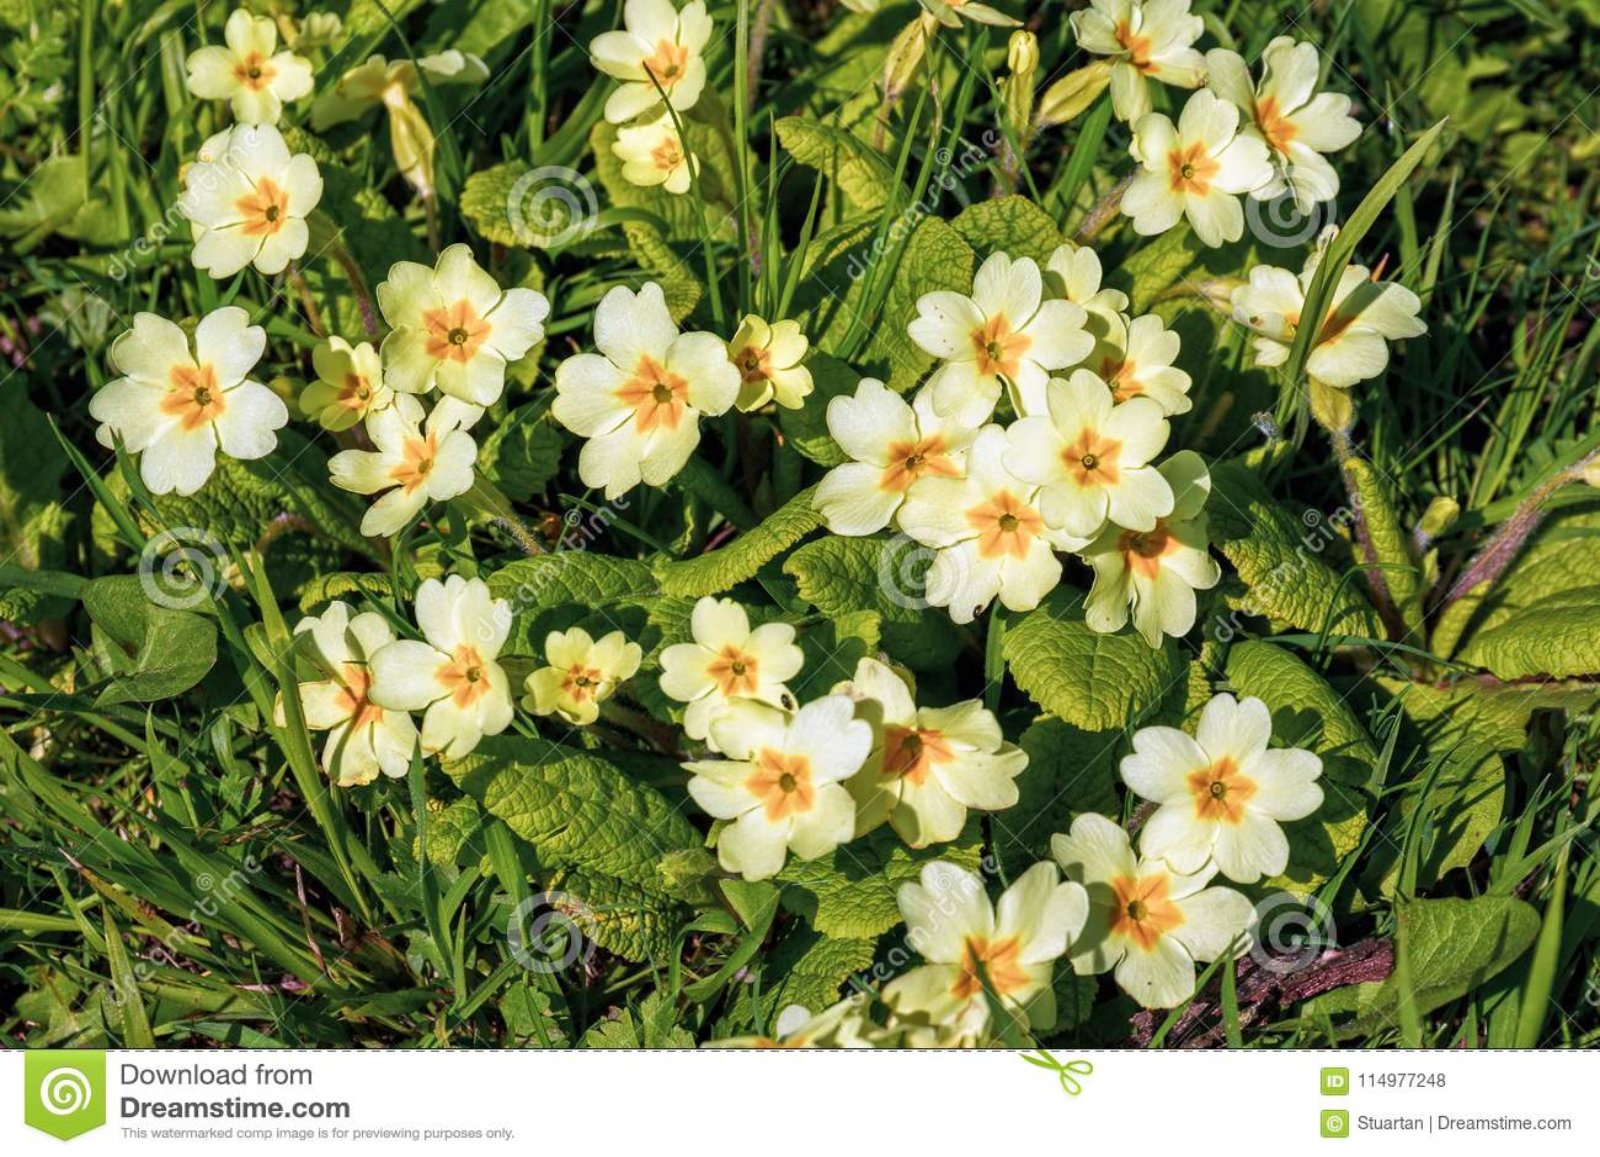 Prímulas selvagens - prímula vulgar, parque de Croome, Worcestershire